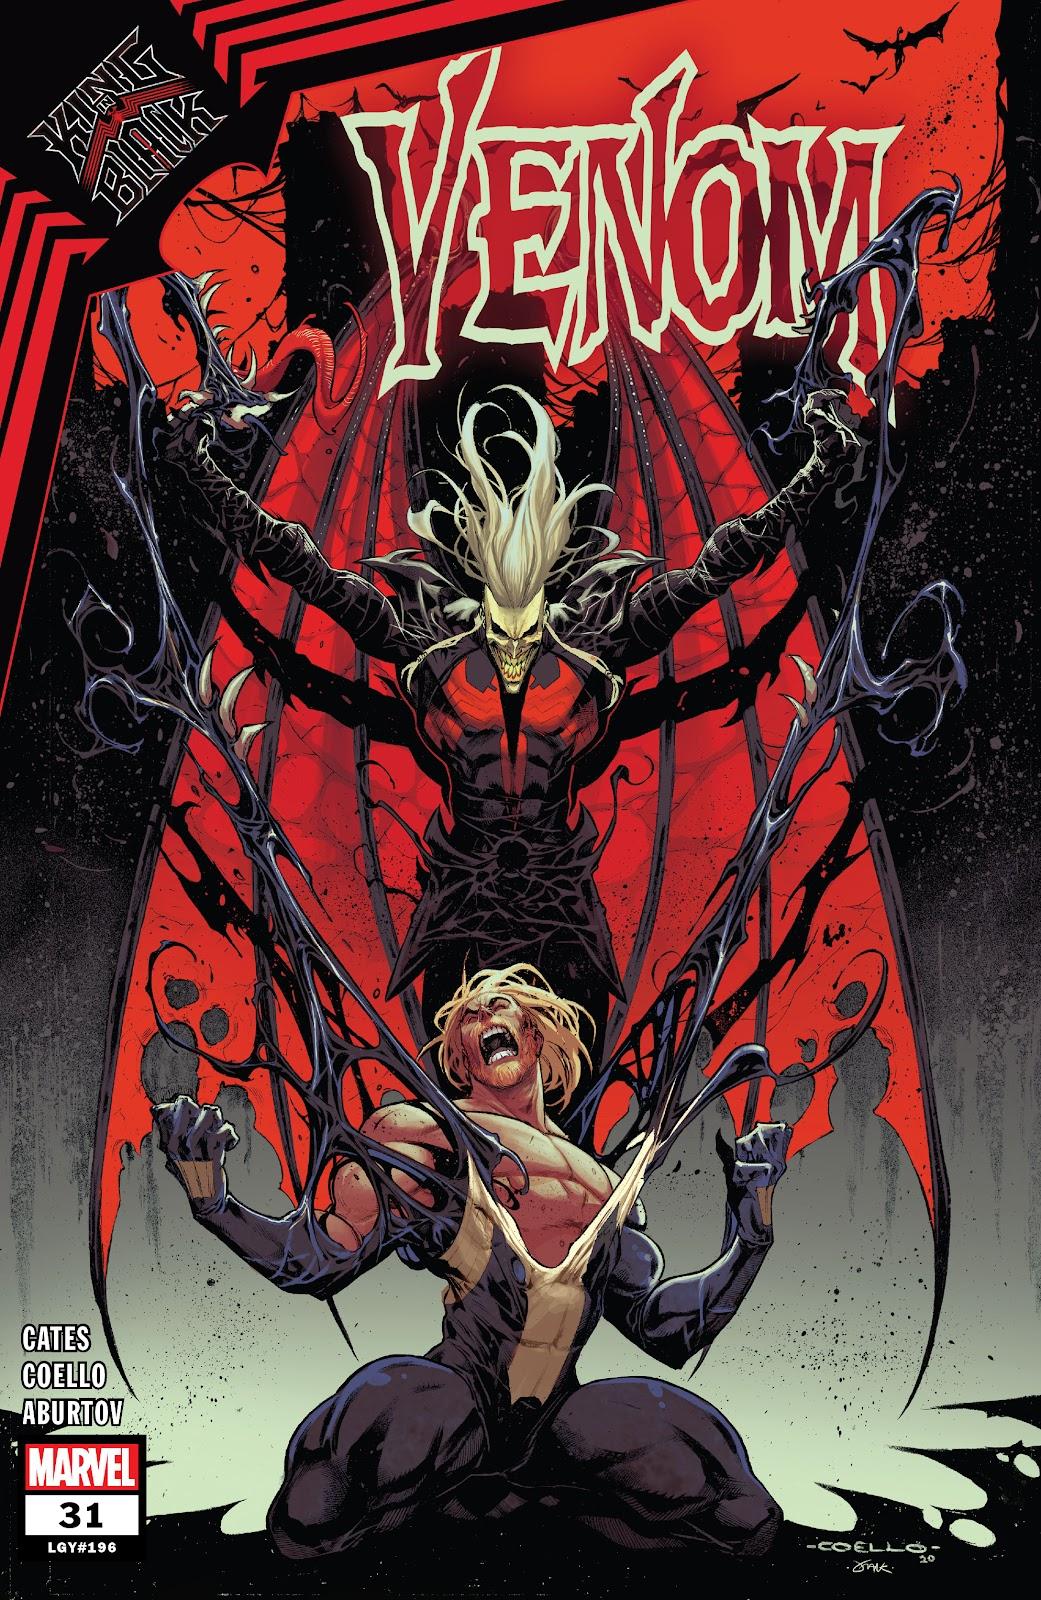 Venom (2018) 33 Page 1